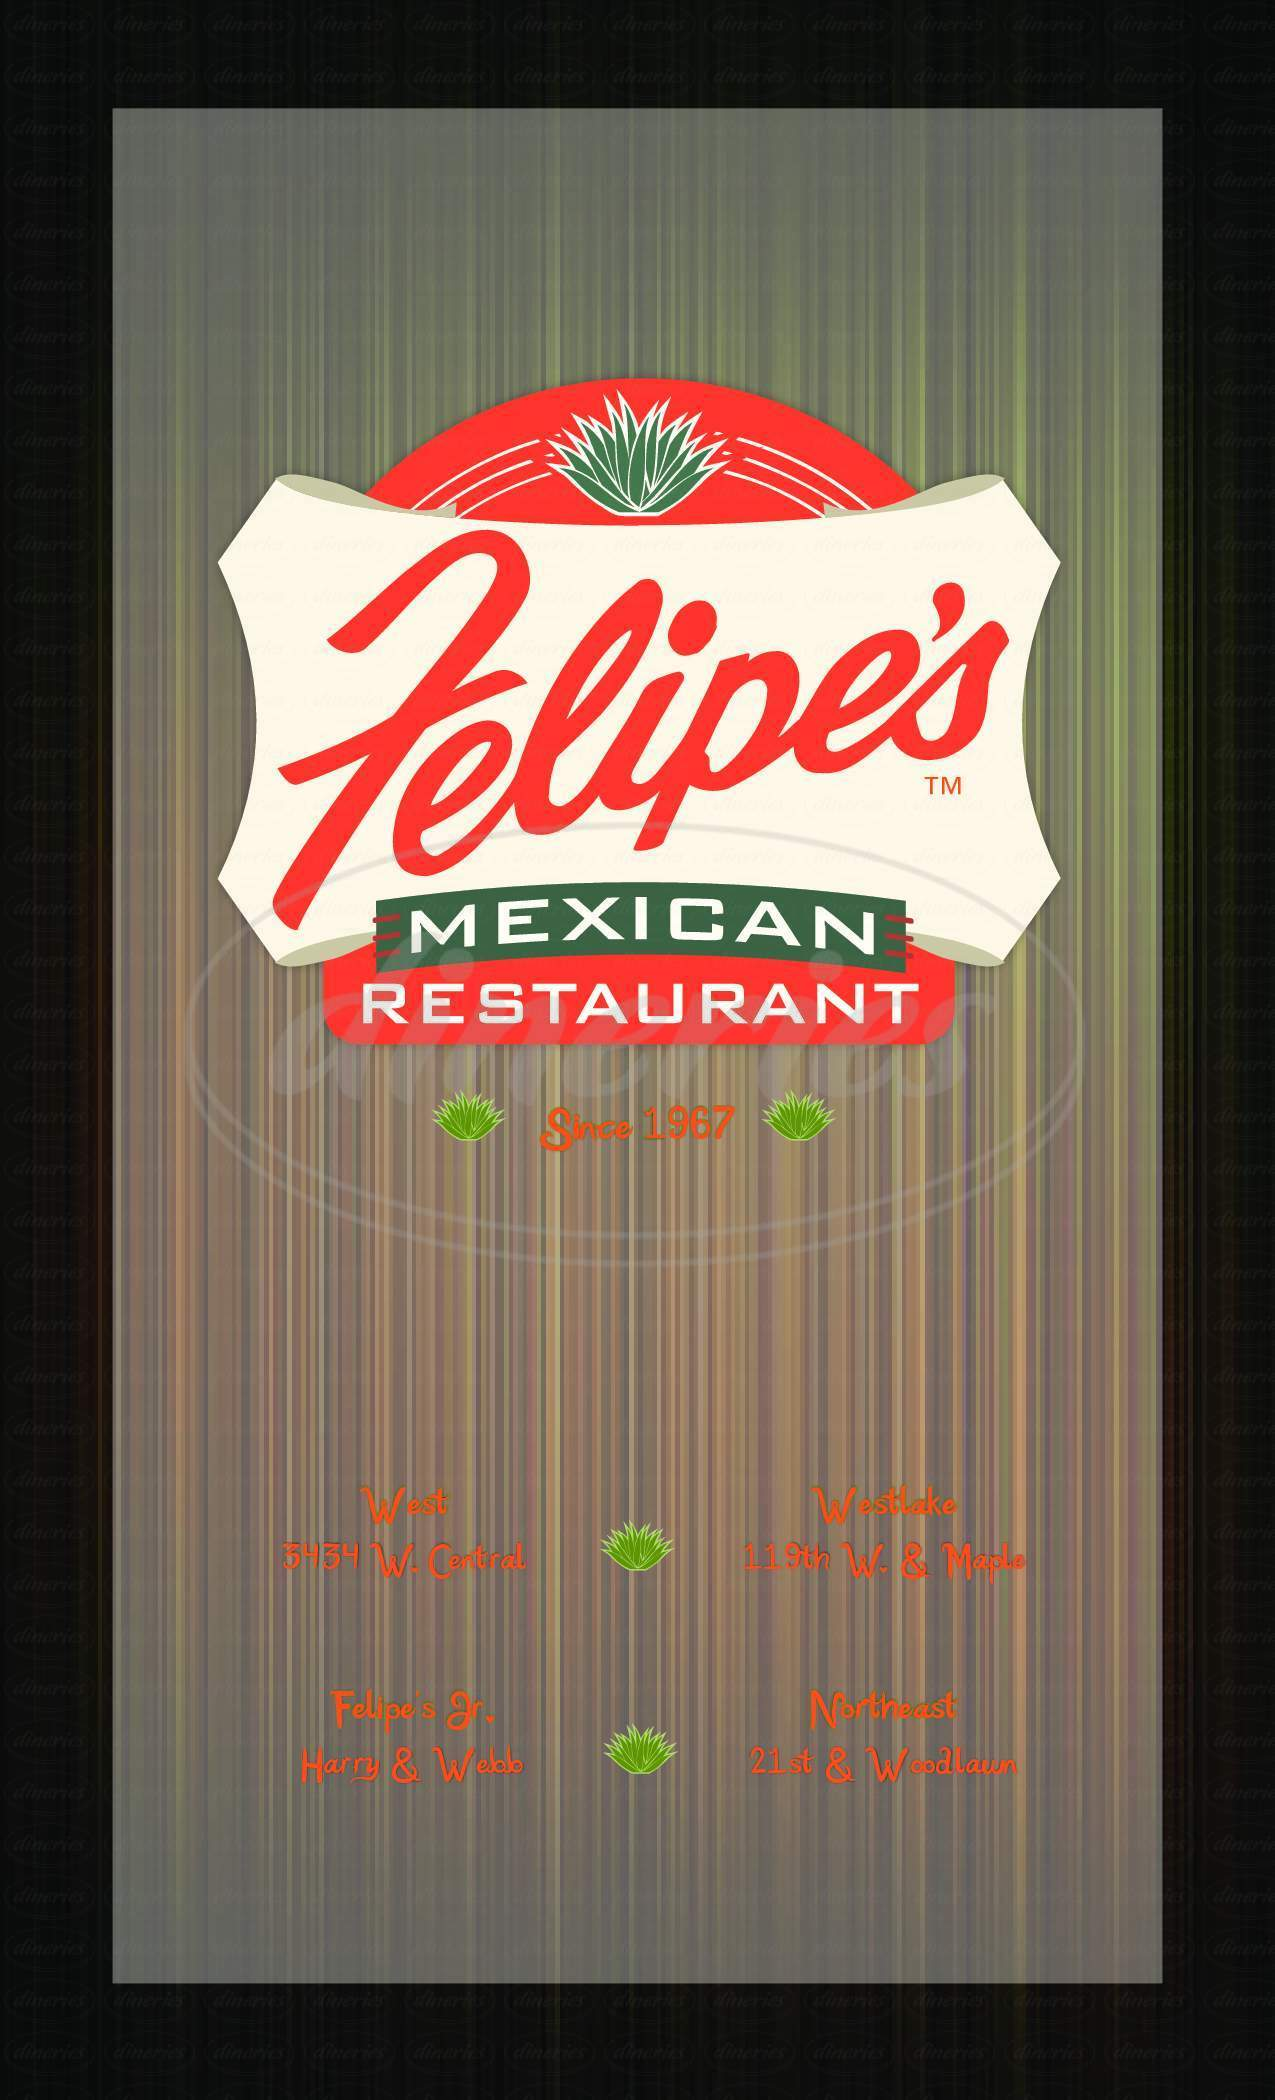 menu for Felipe's Mexican Restaurant